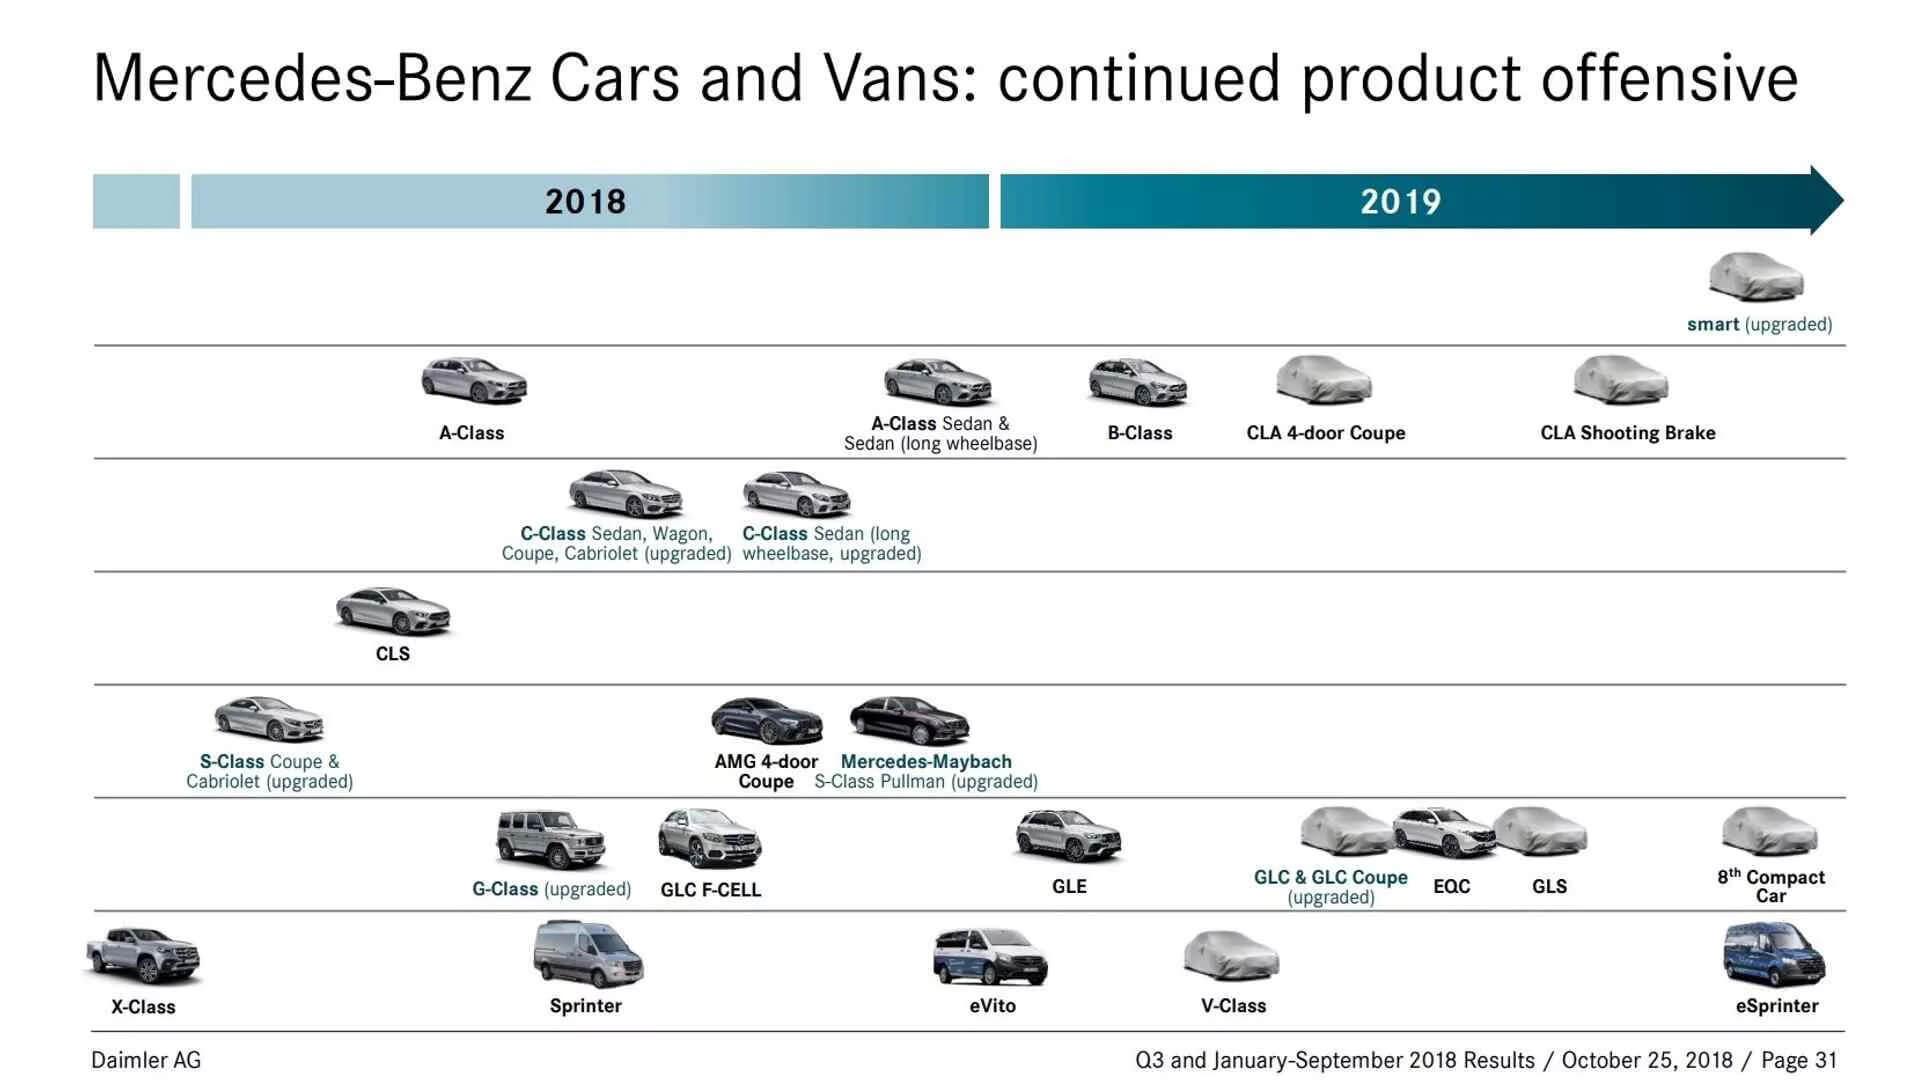 Официальная дорожная карта Mercedes-Benz на 2018-2019 годы